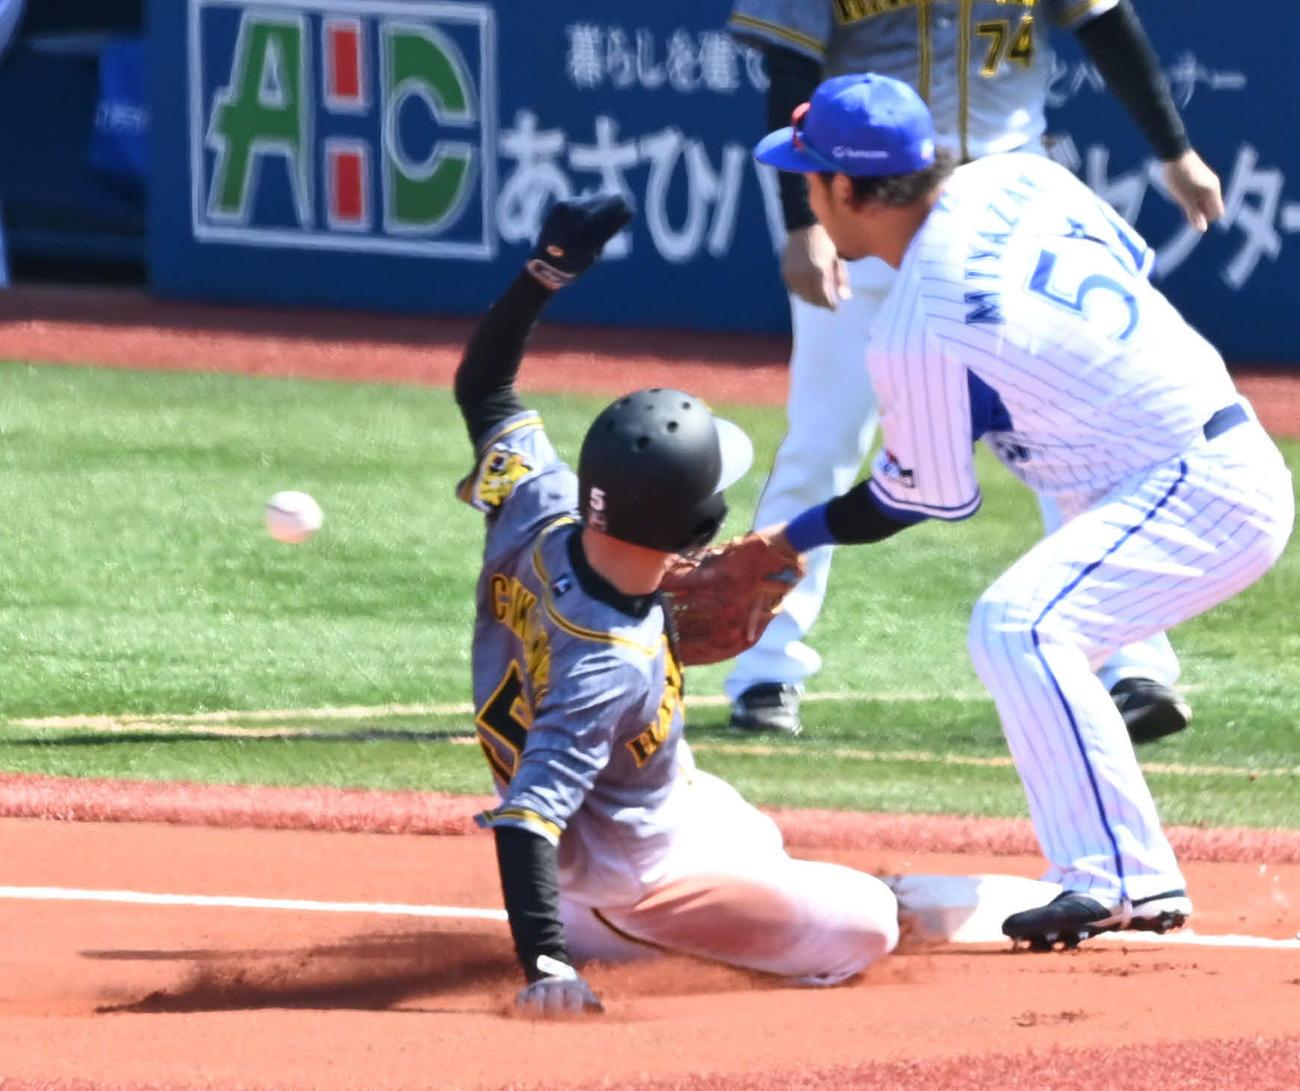 DeNA対阪神 1回表阪神無死一、二塁、マルテが三振した間に三塁盗塁を決める近本(左)(撮影・山崎安昭)